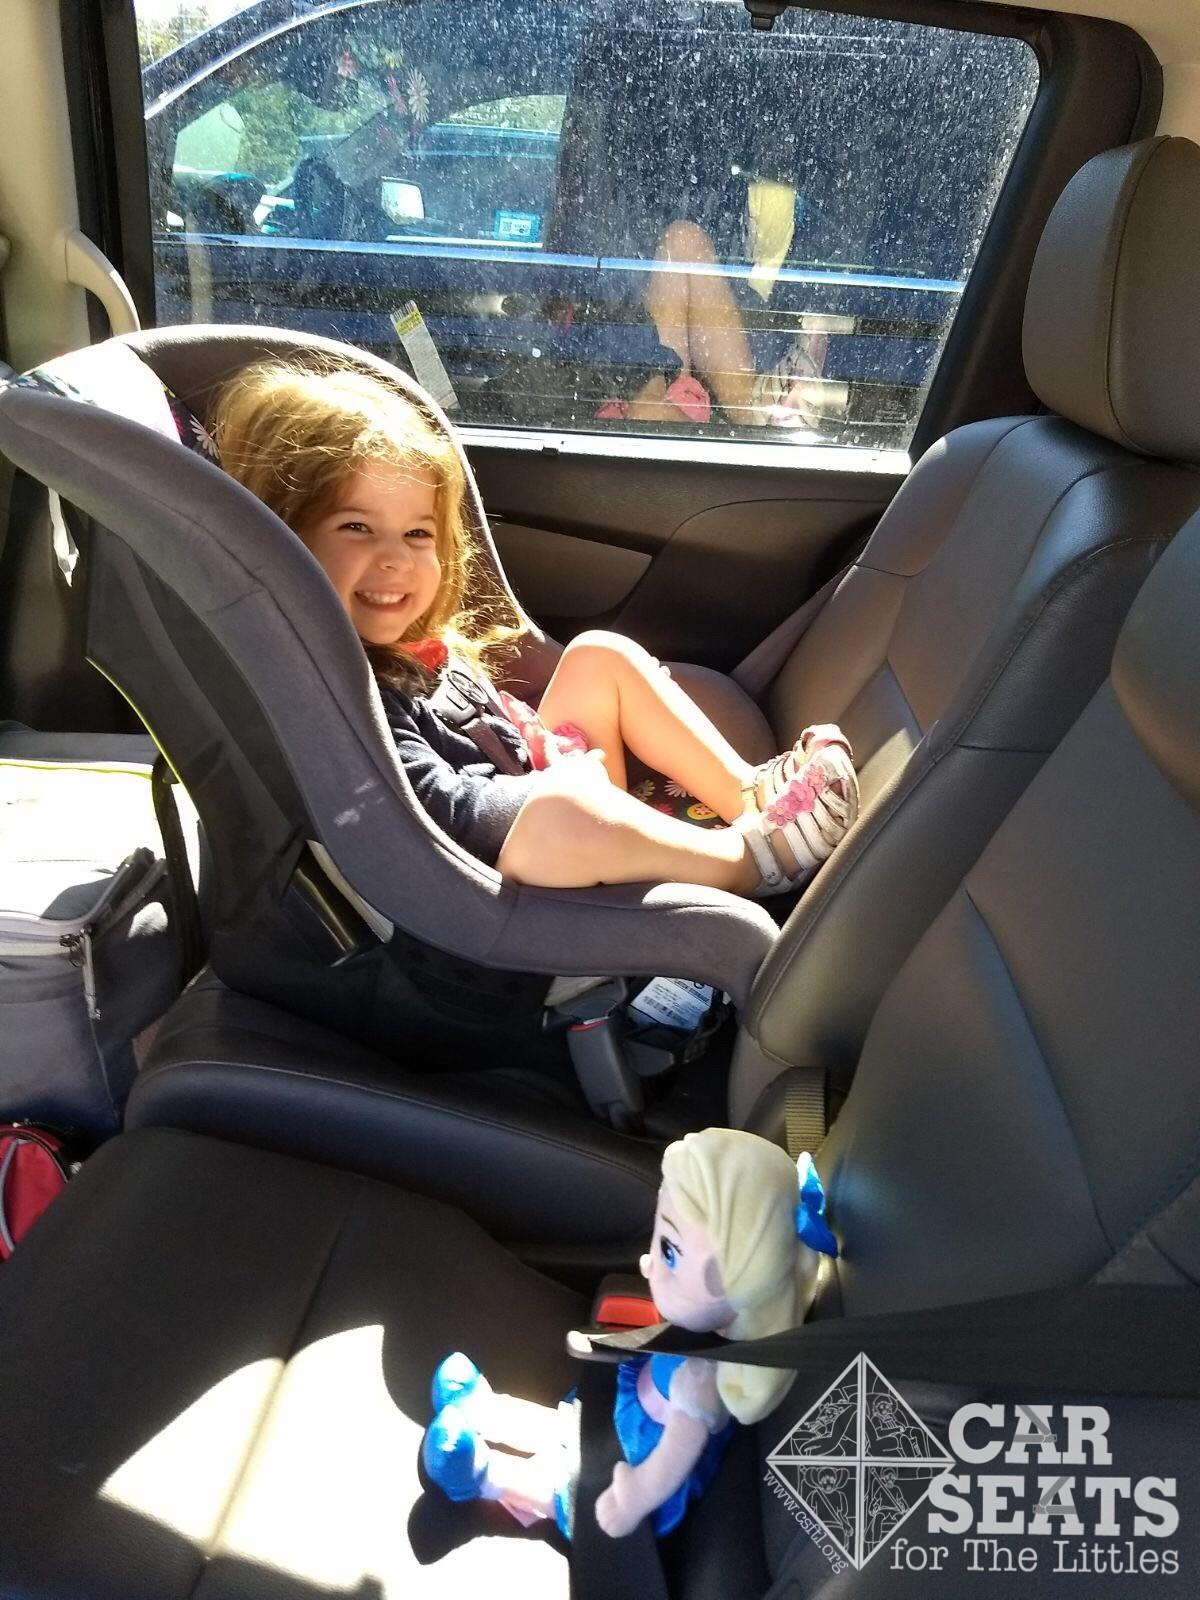 Cosco Car Seat Strap Diagram Cosco Scenera Next Review Car Seats for the Littles Of Cosco Car Seat Strap Diagram